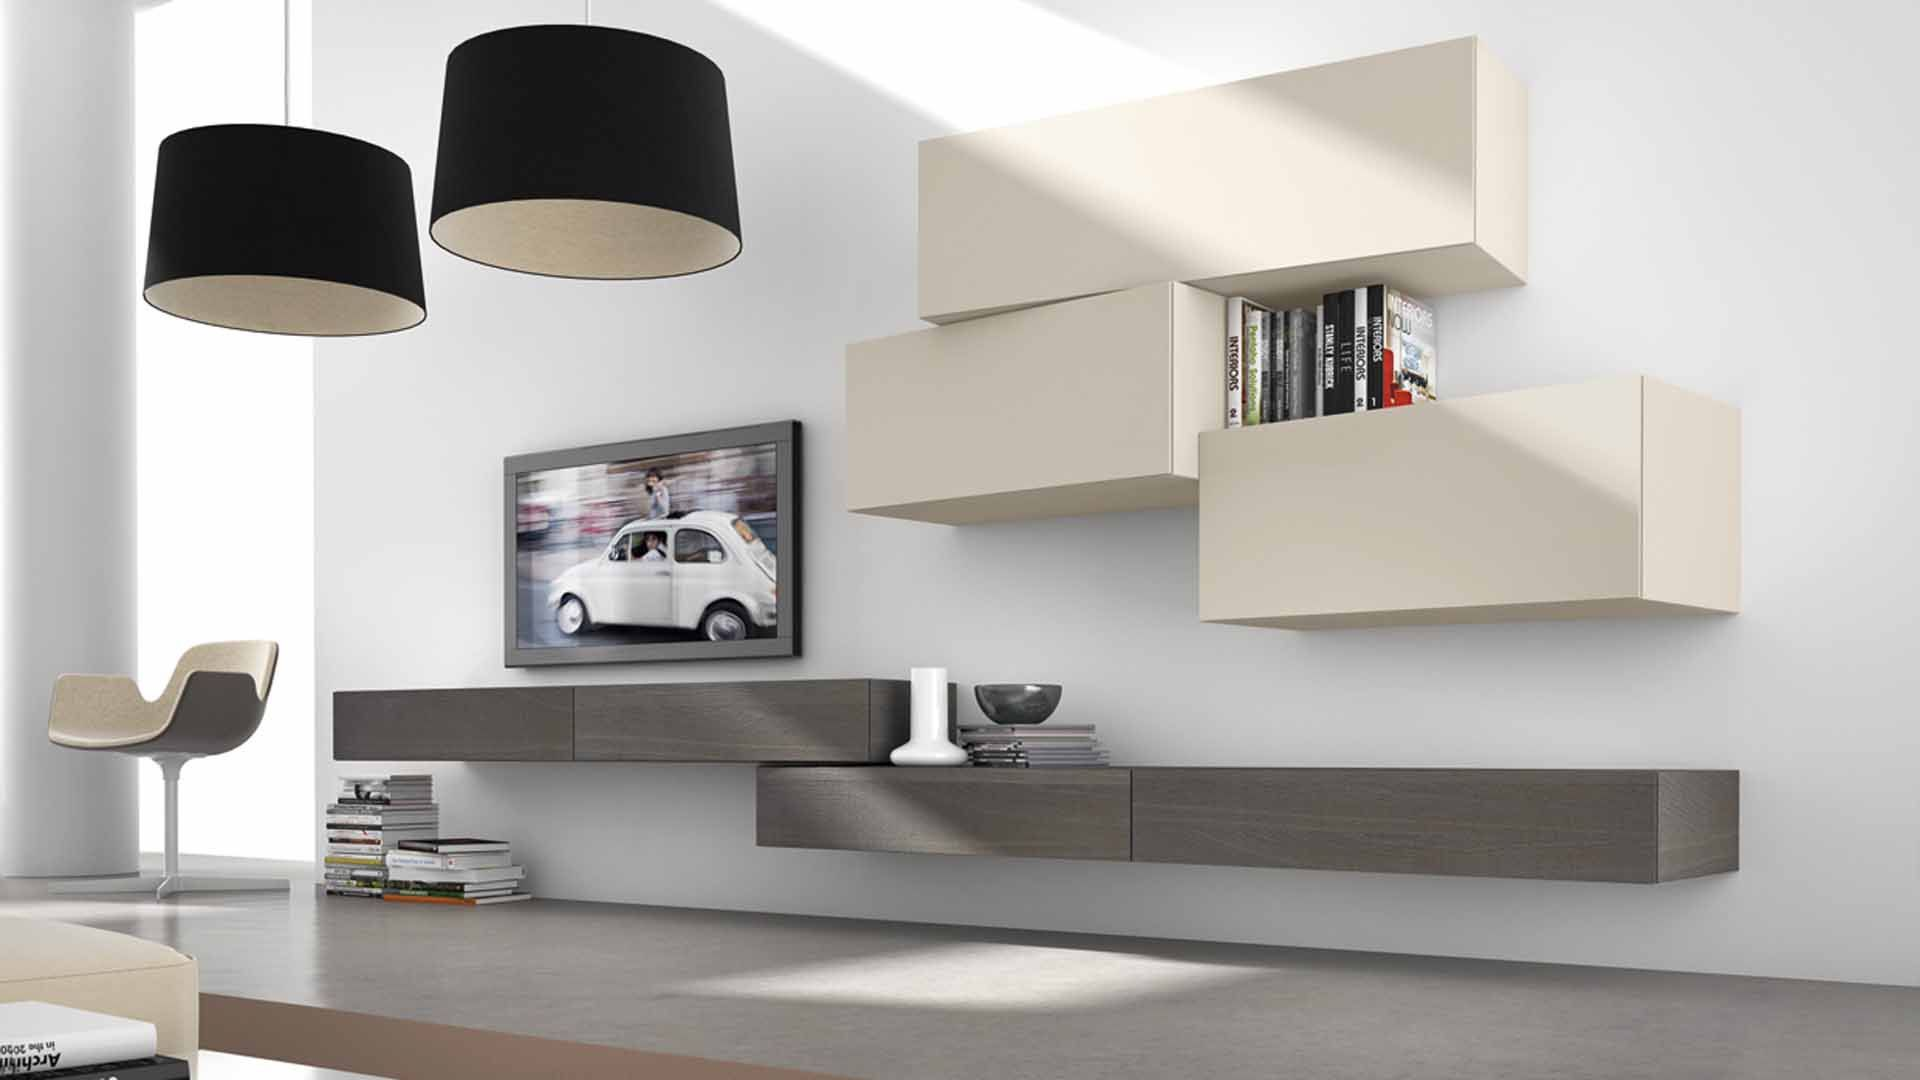 Meubles modern inclinart de presotto chez raphaele for Presotto industrie mobili spa